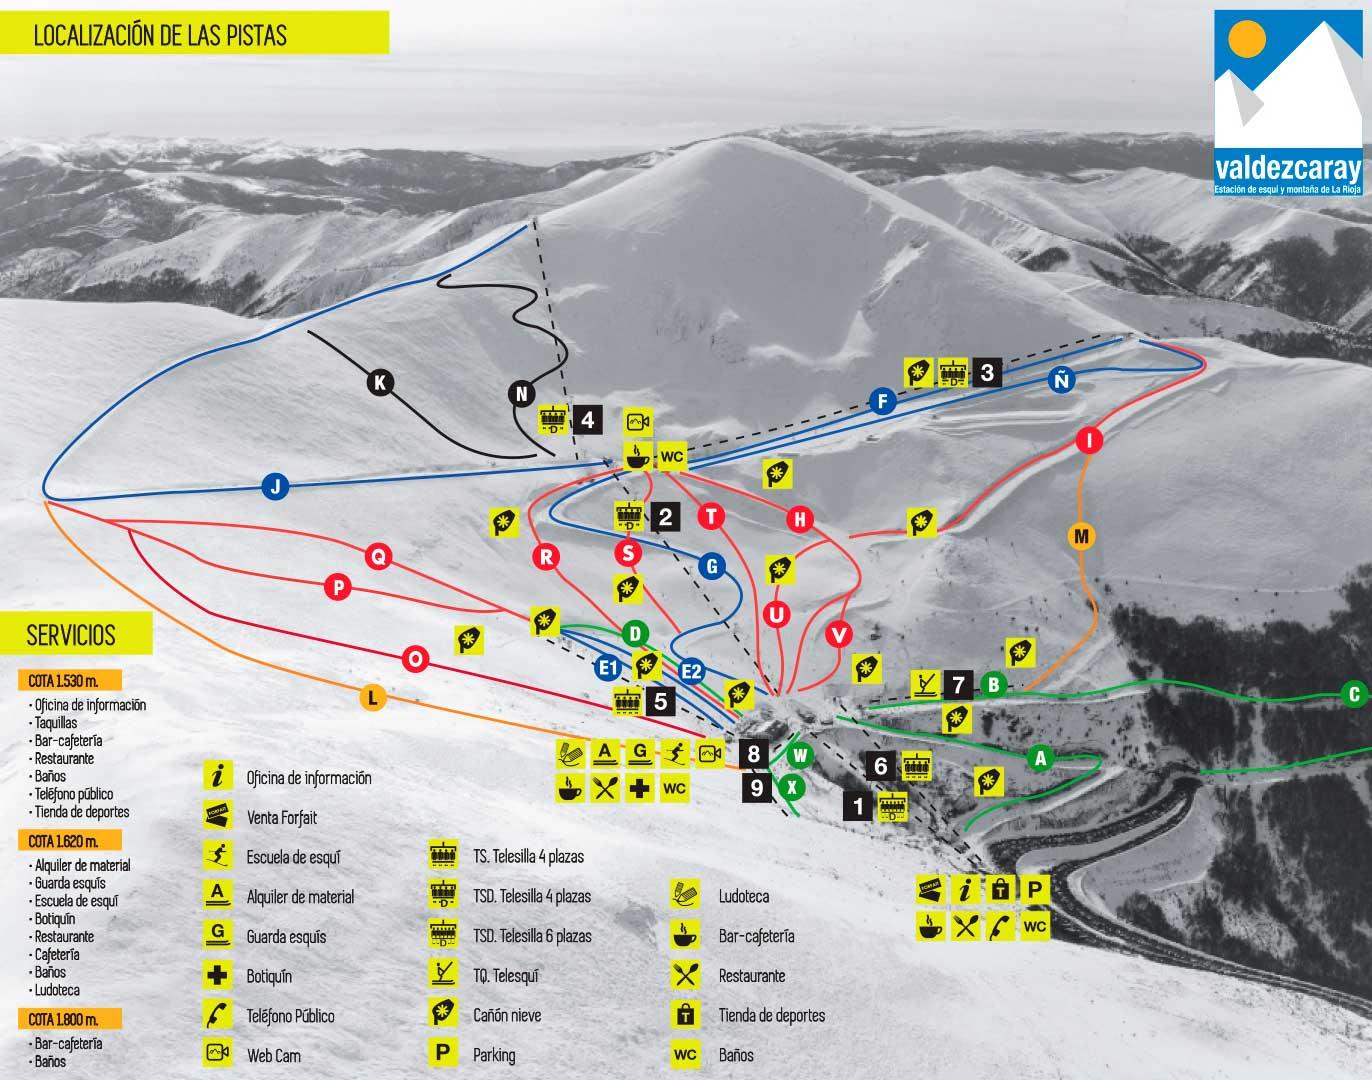 Valdezcaray Plan des pistes